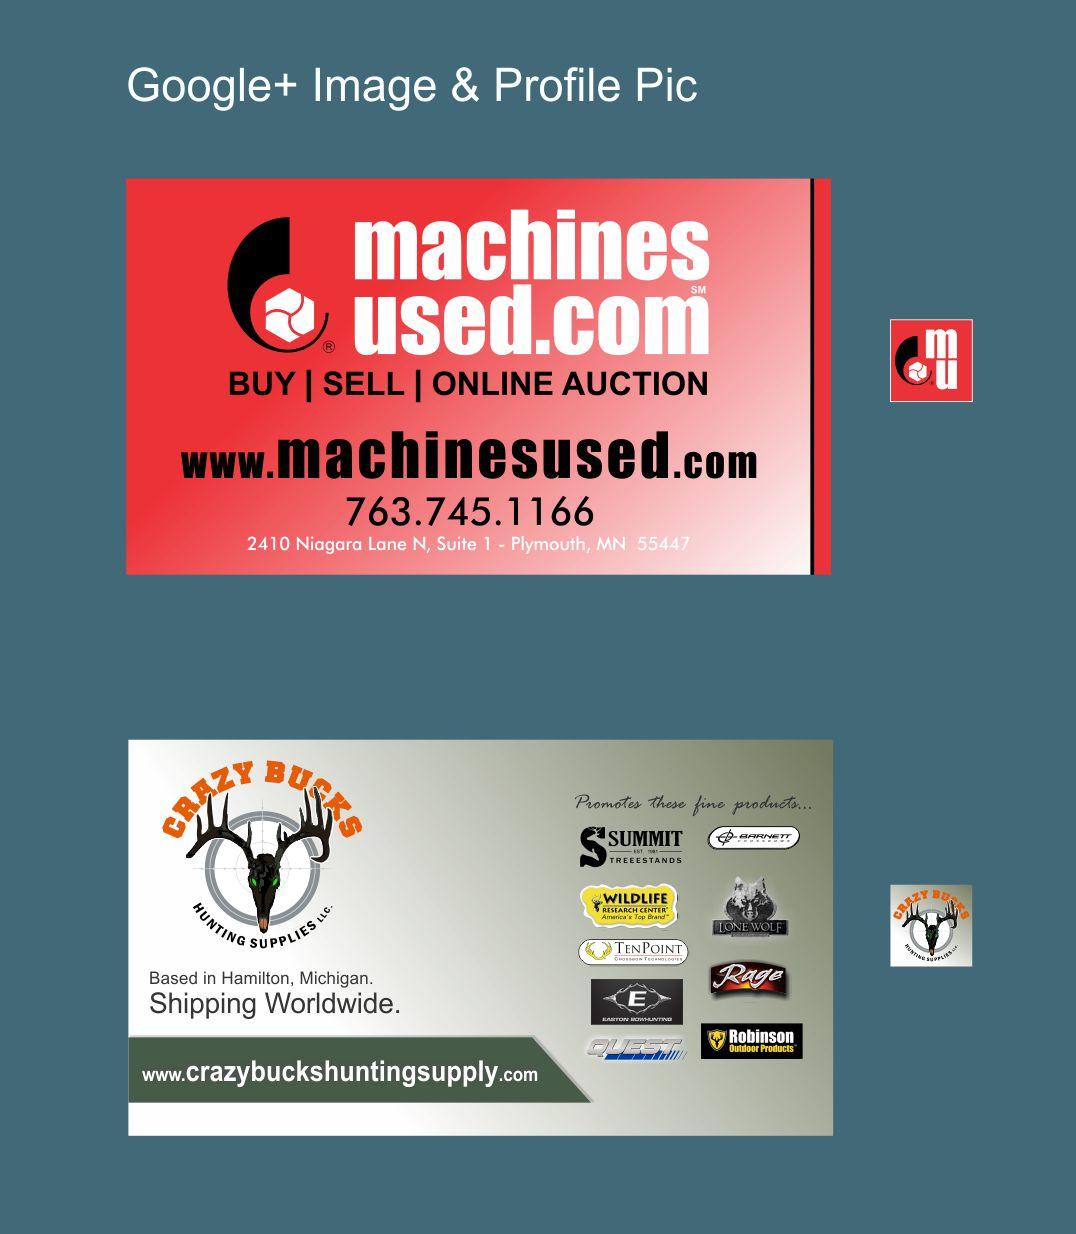 Machines Used.com & Crazy Bucks